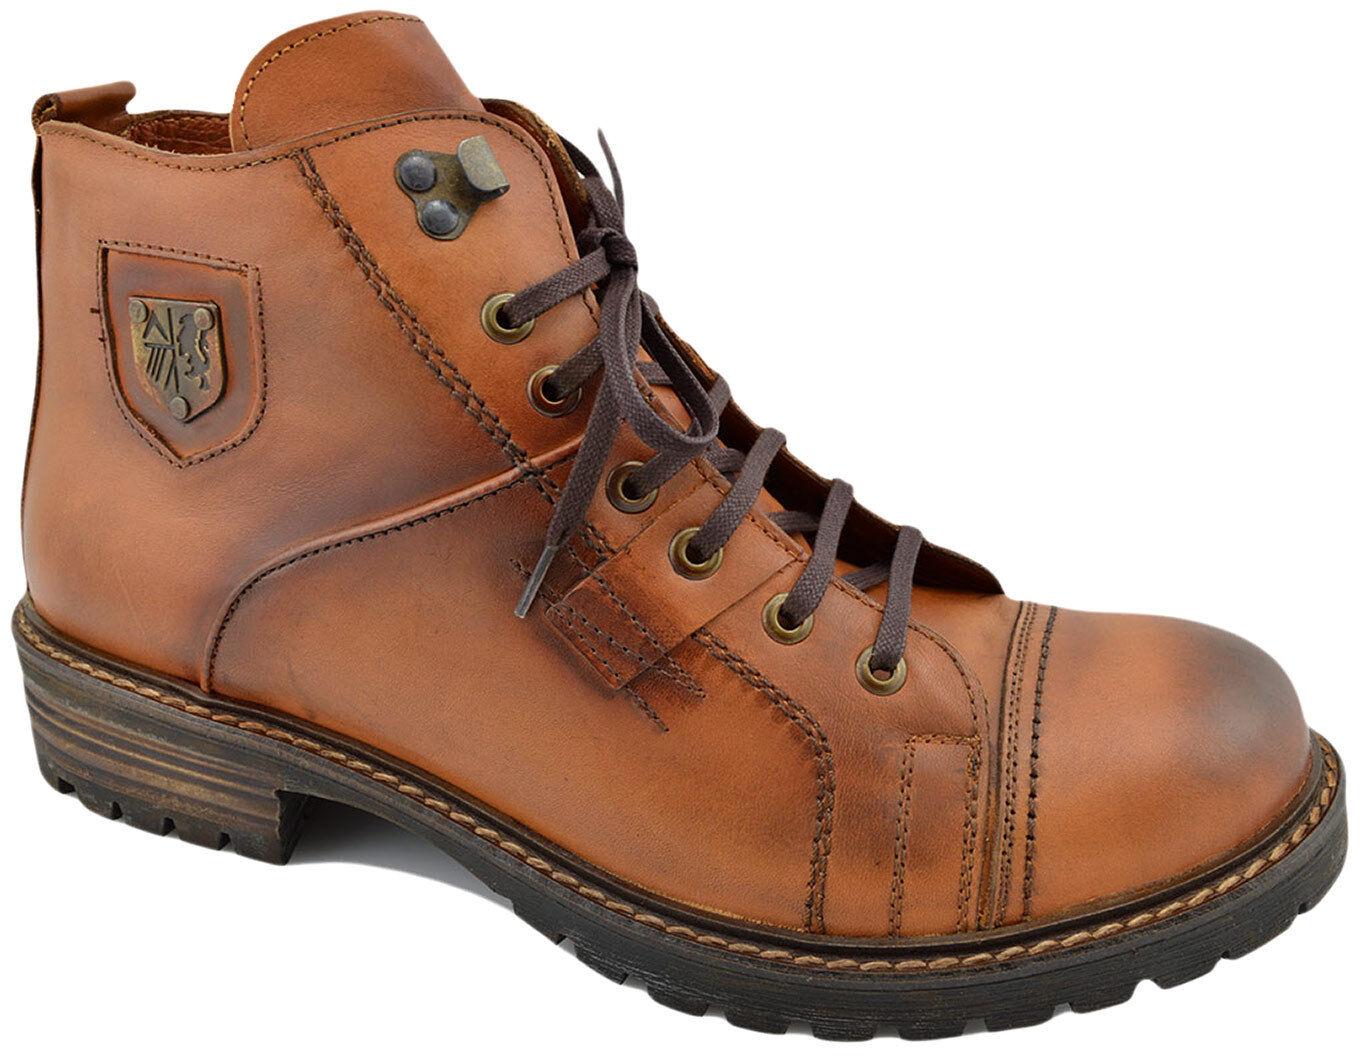 200 REACTOR Tan Marronee Leather BIKER Fashion Ankle stivali Men scarpe